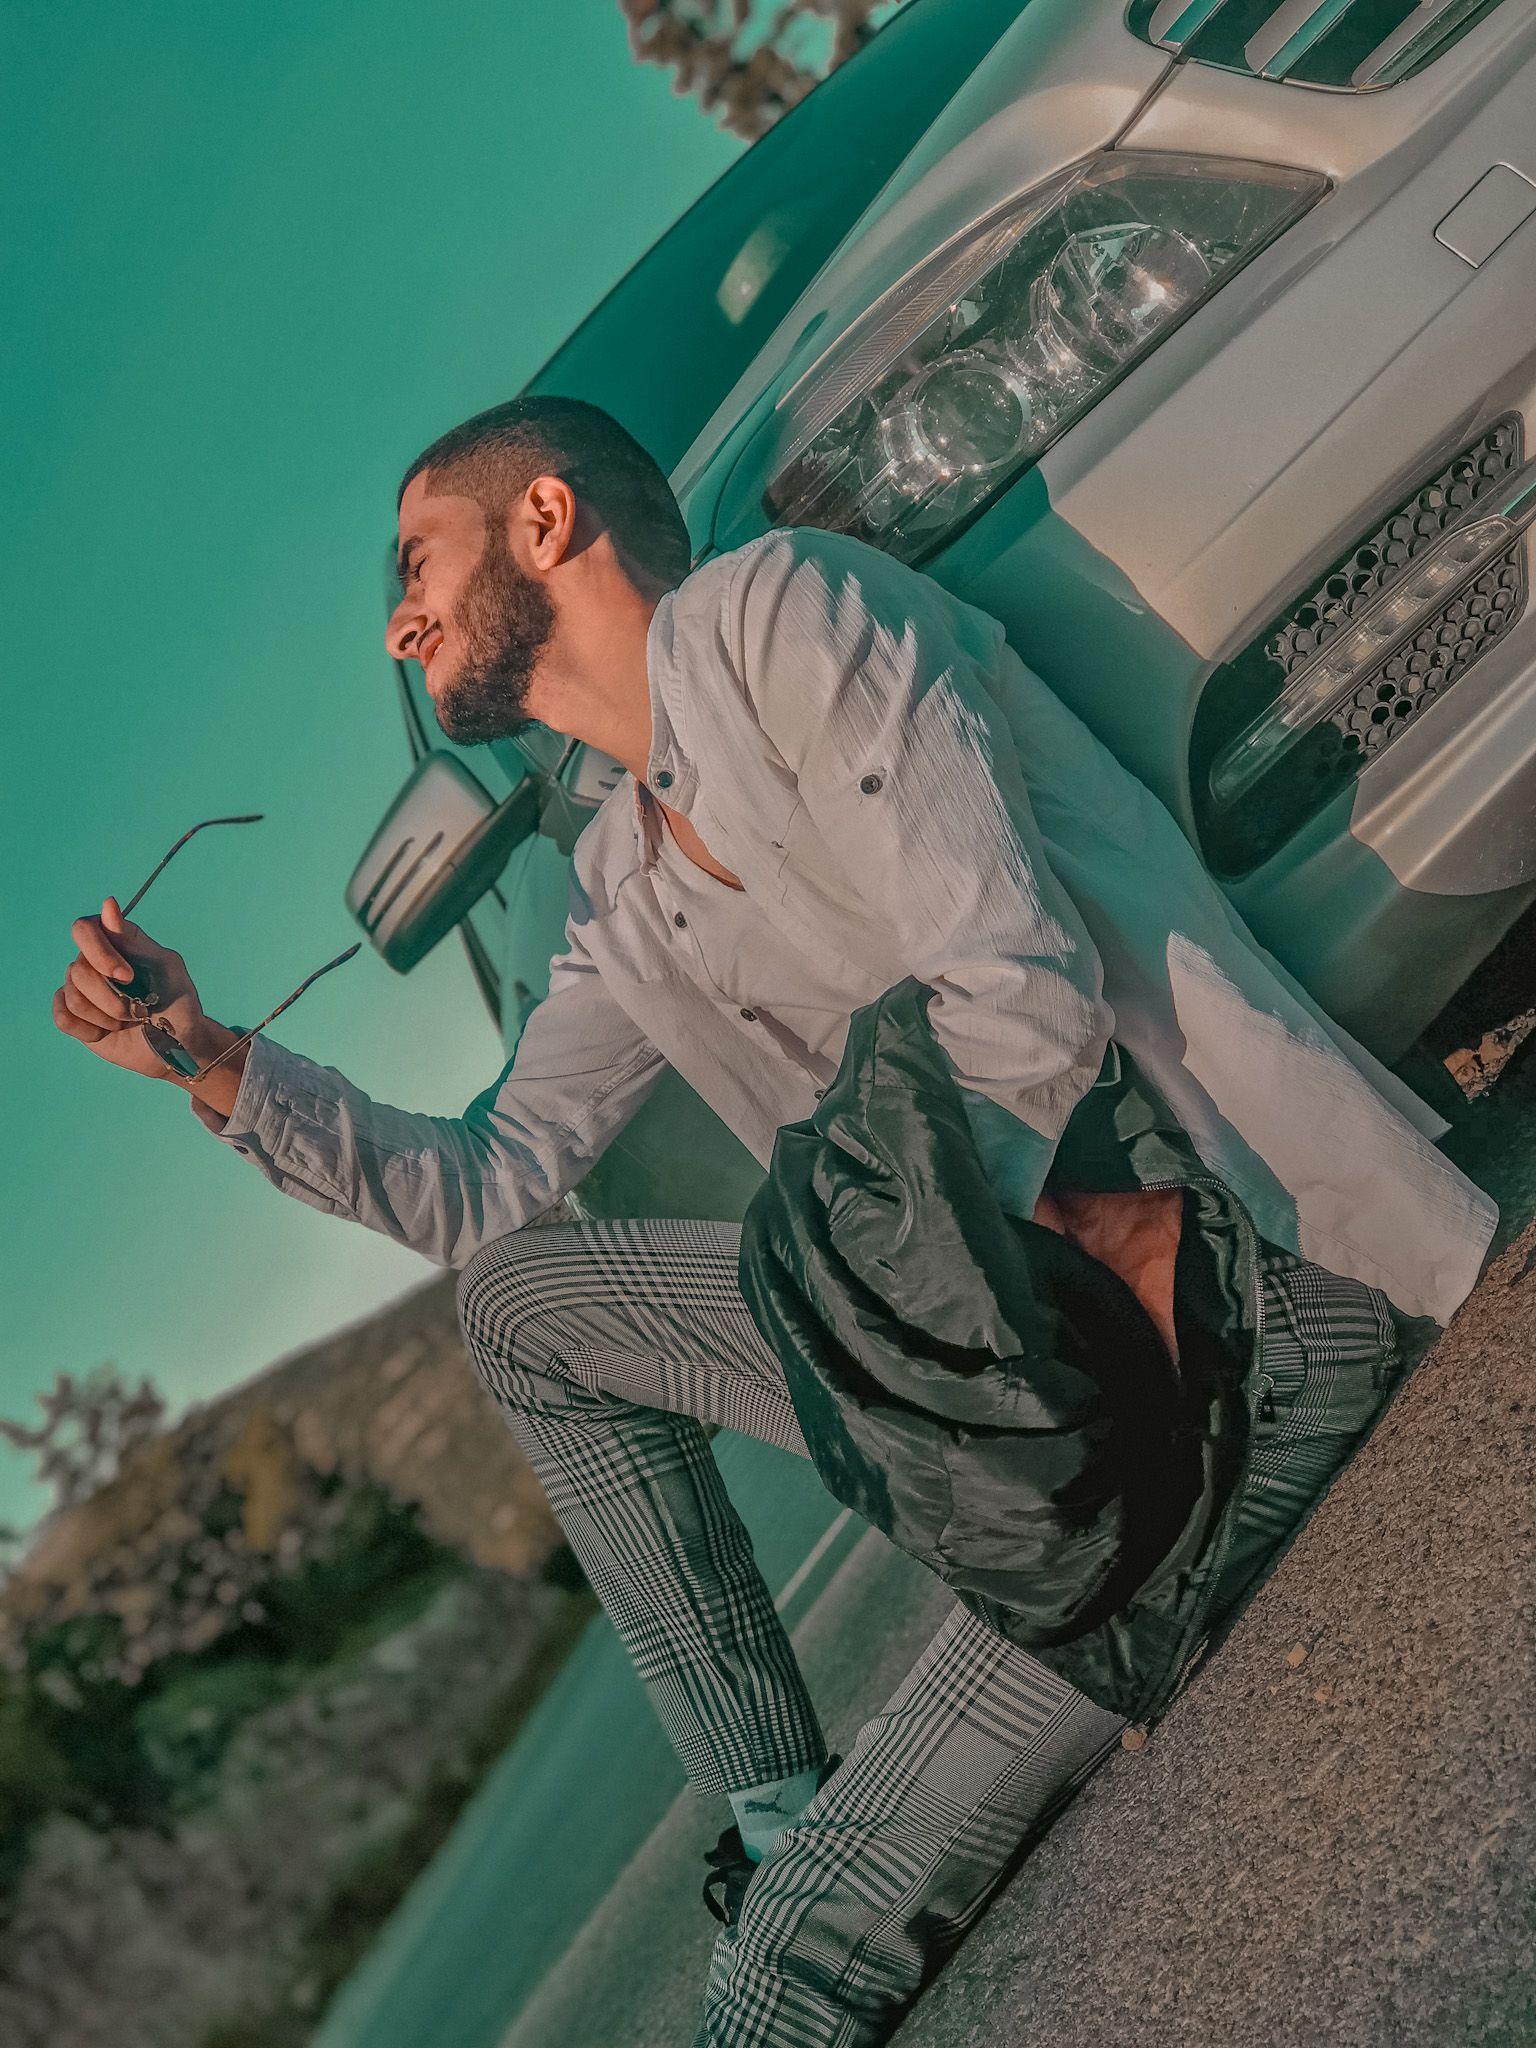 شباب حلوين للتصميم شباب عراقيين شباب كشخه Biker Photoshoot Cosplay Boy Instagram Photo